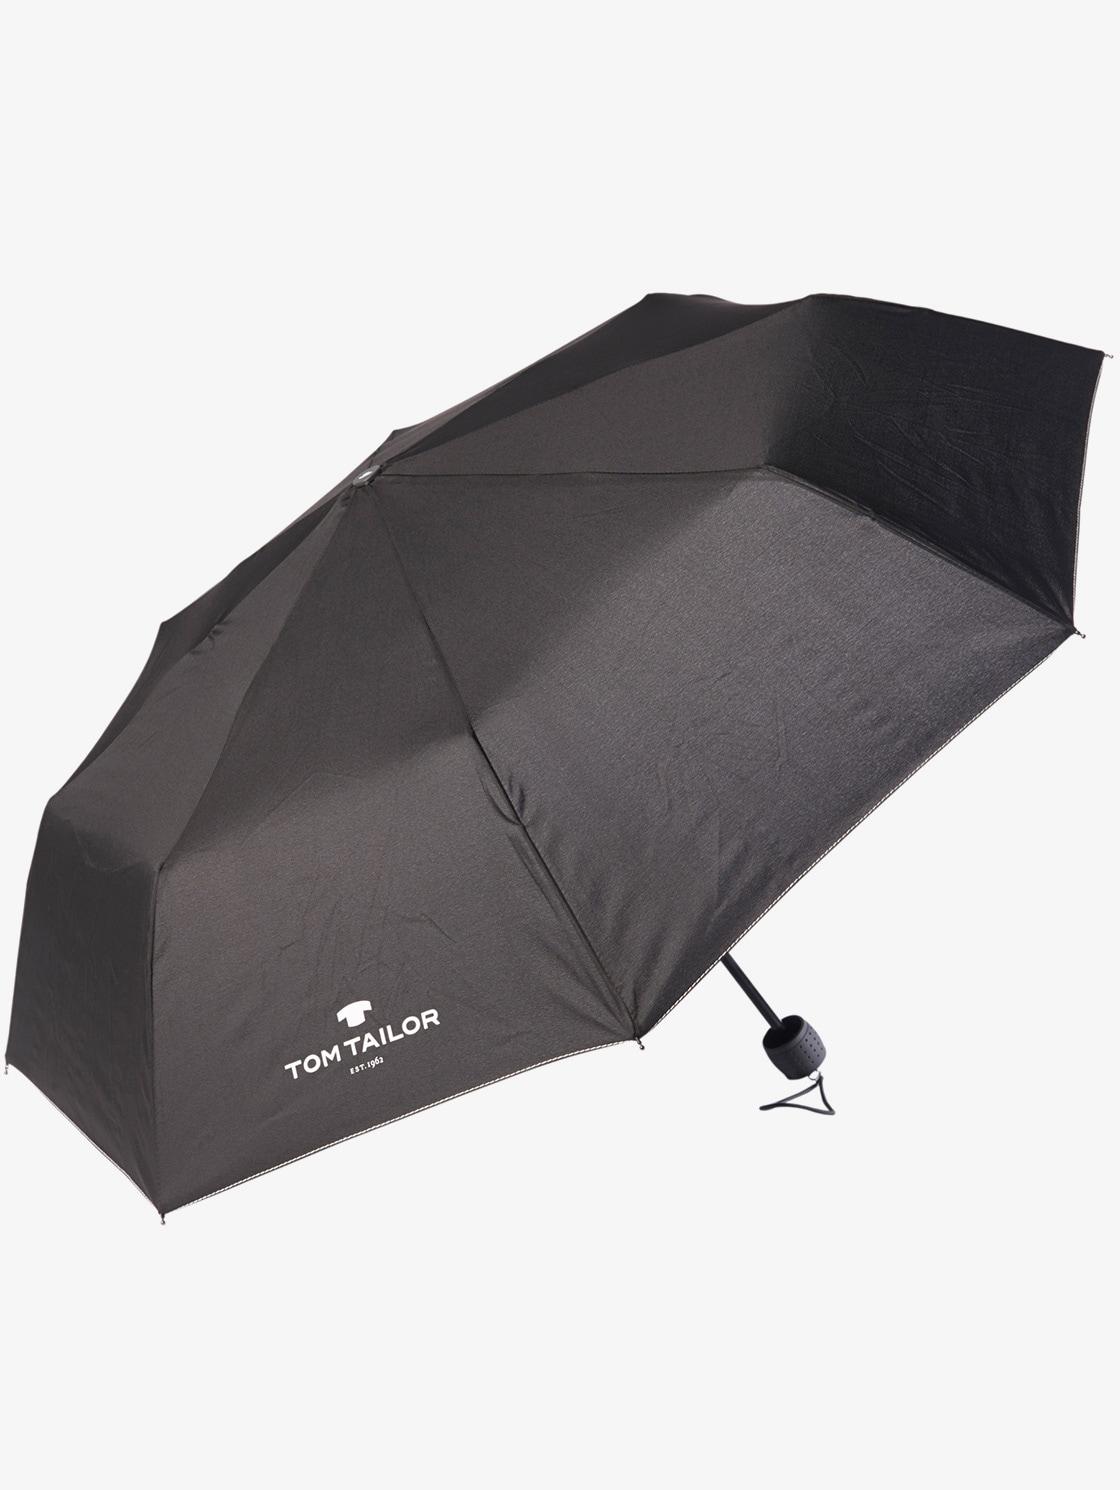 Tom Tailor klassischer Regenschirm, Unisex, black, Größe: OneSize